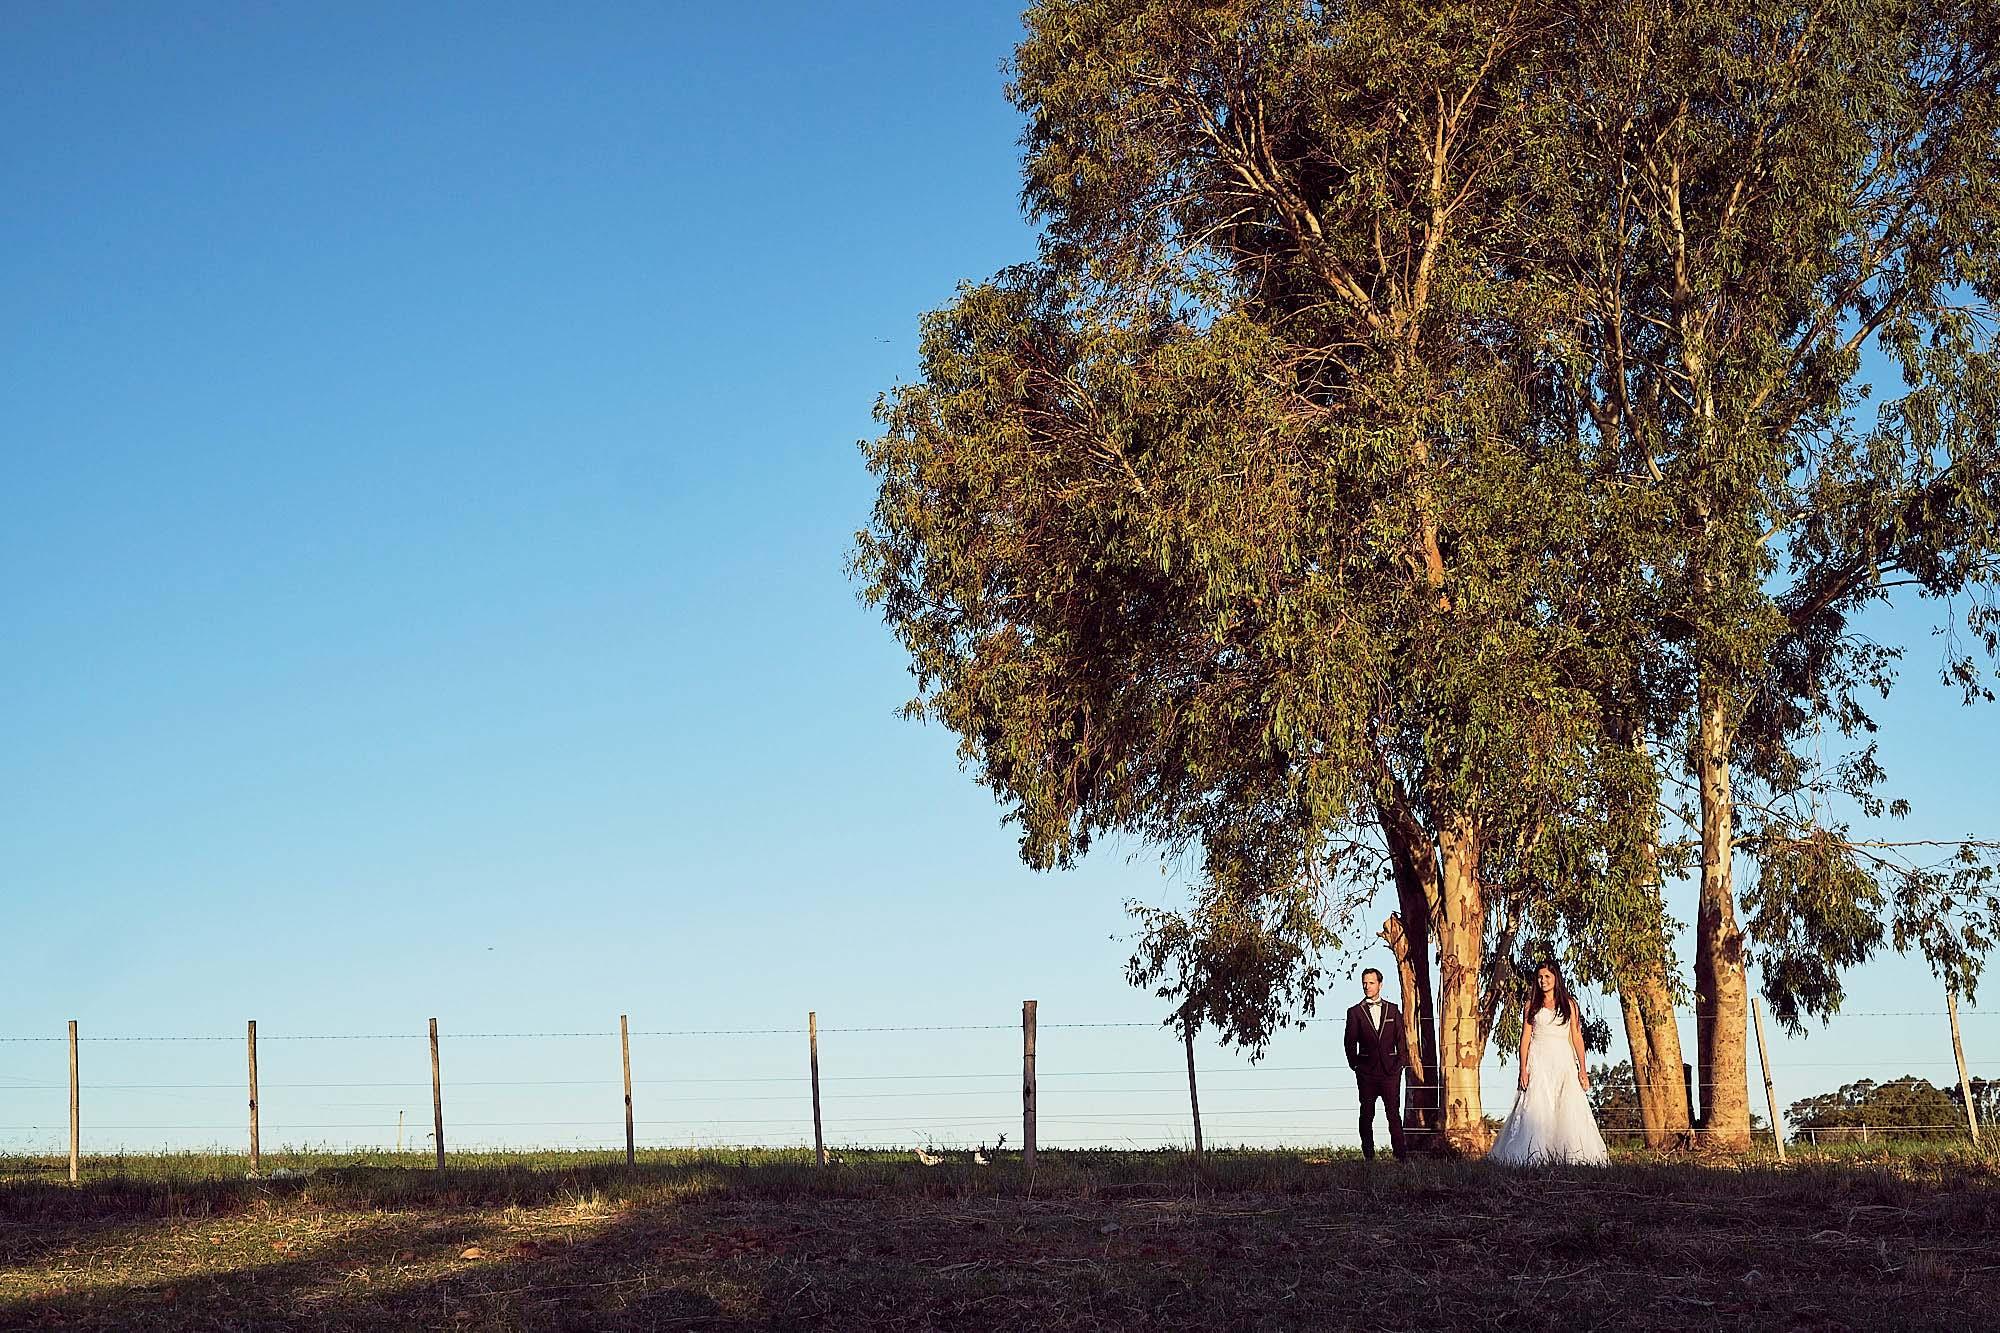 post boda creativa en el campo - uruguay - www.fabriziomaulella.com